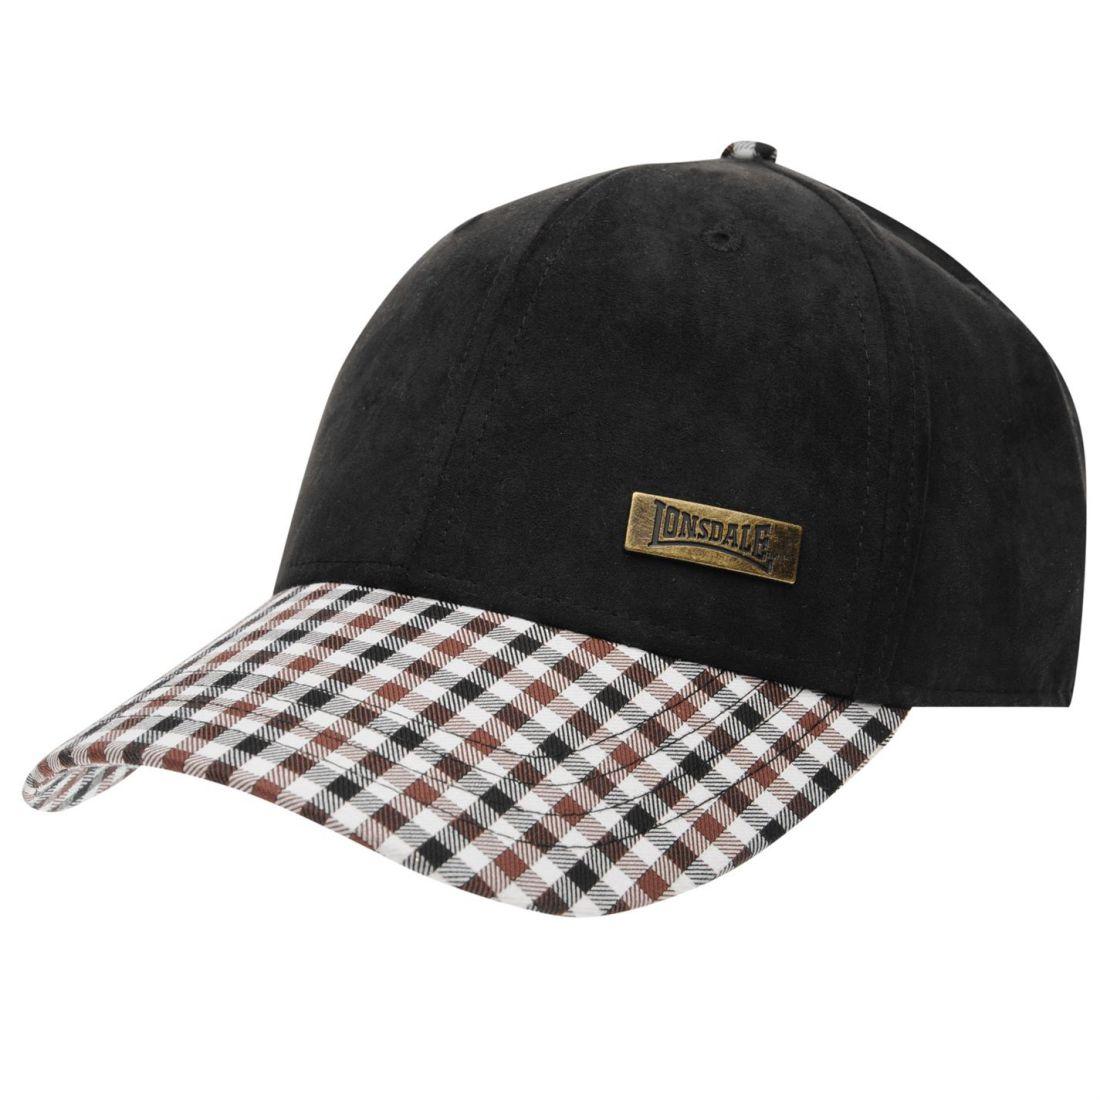 71ff96bf6d Lonsdale Premium Cap Mens Gents Baseball Breathable Panel Design   eBay